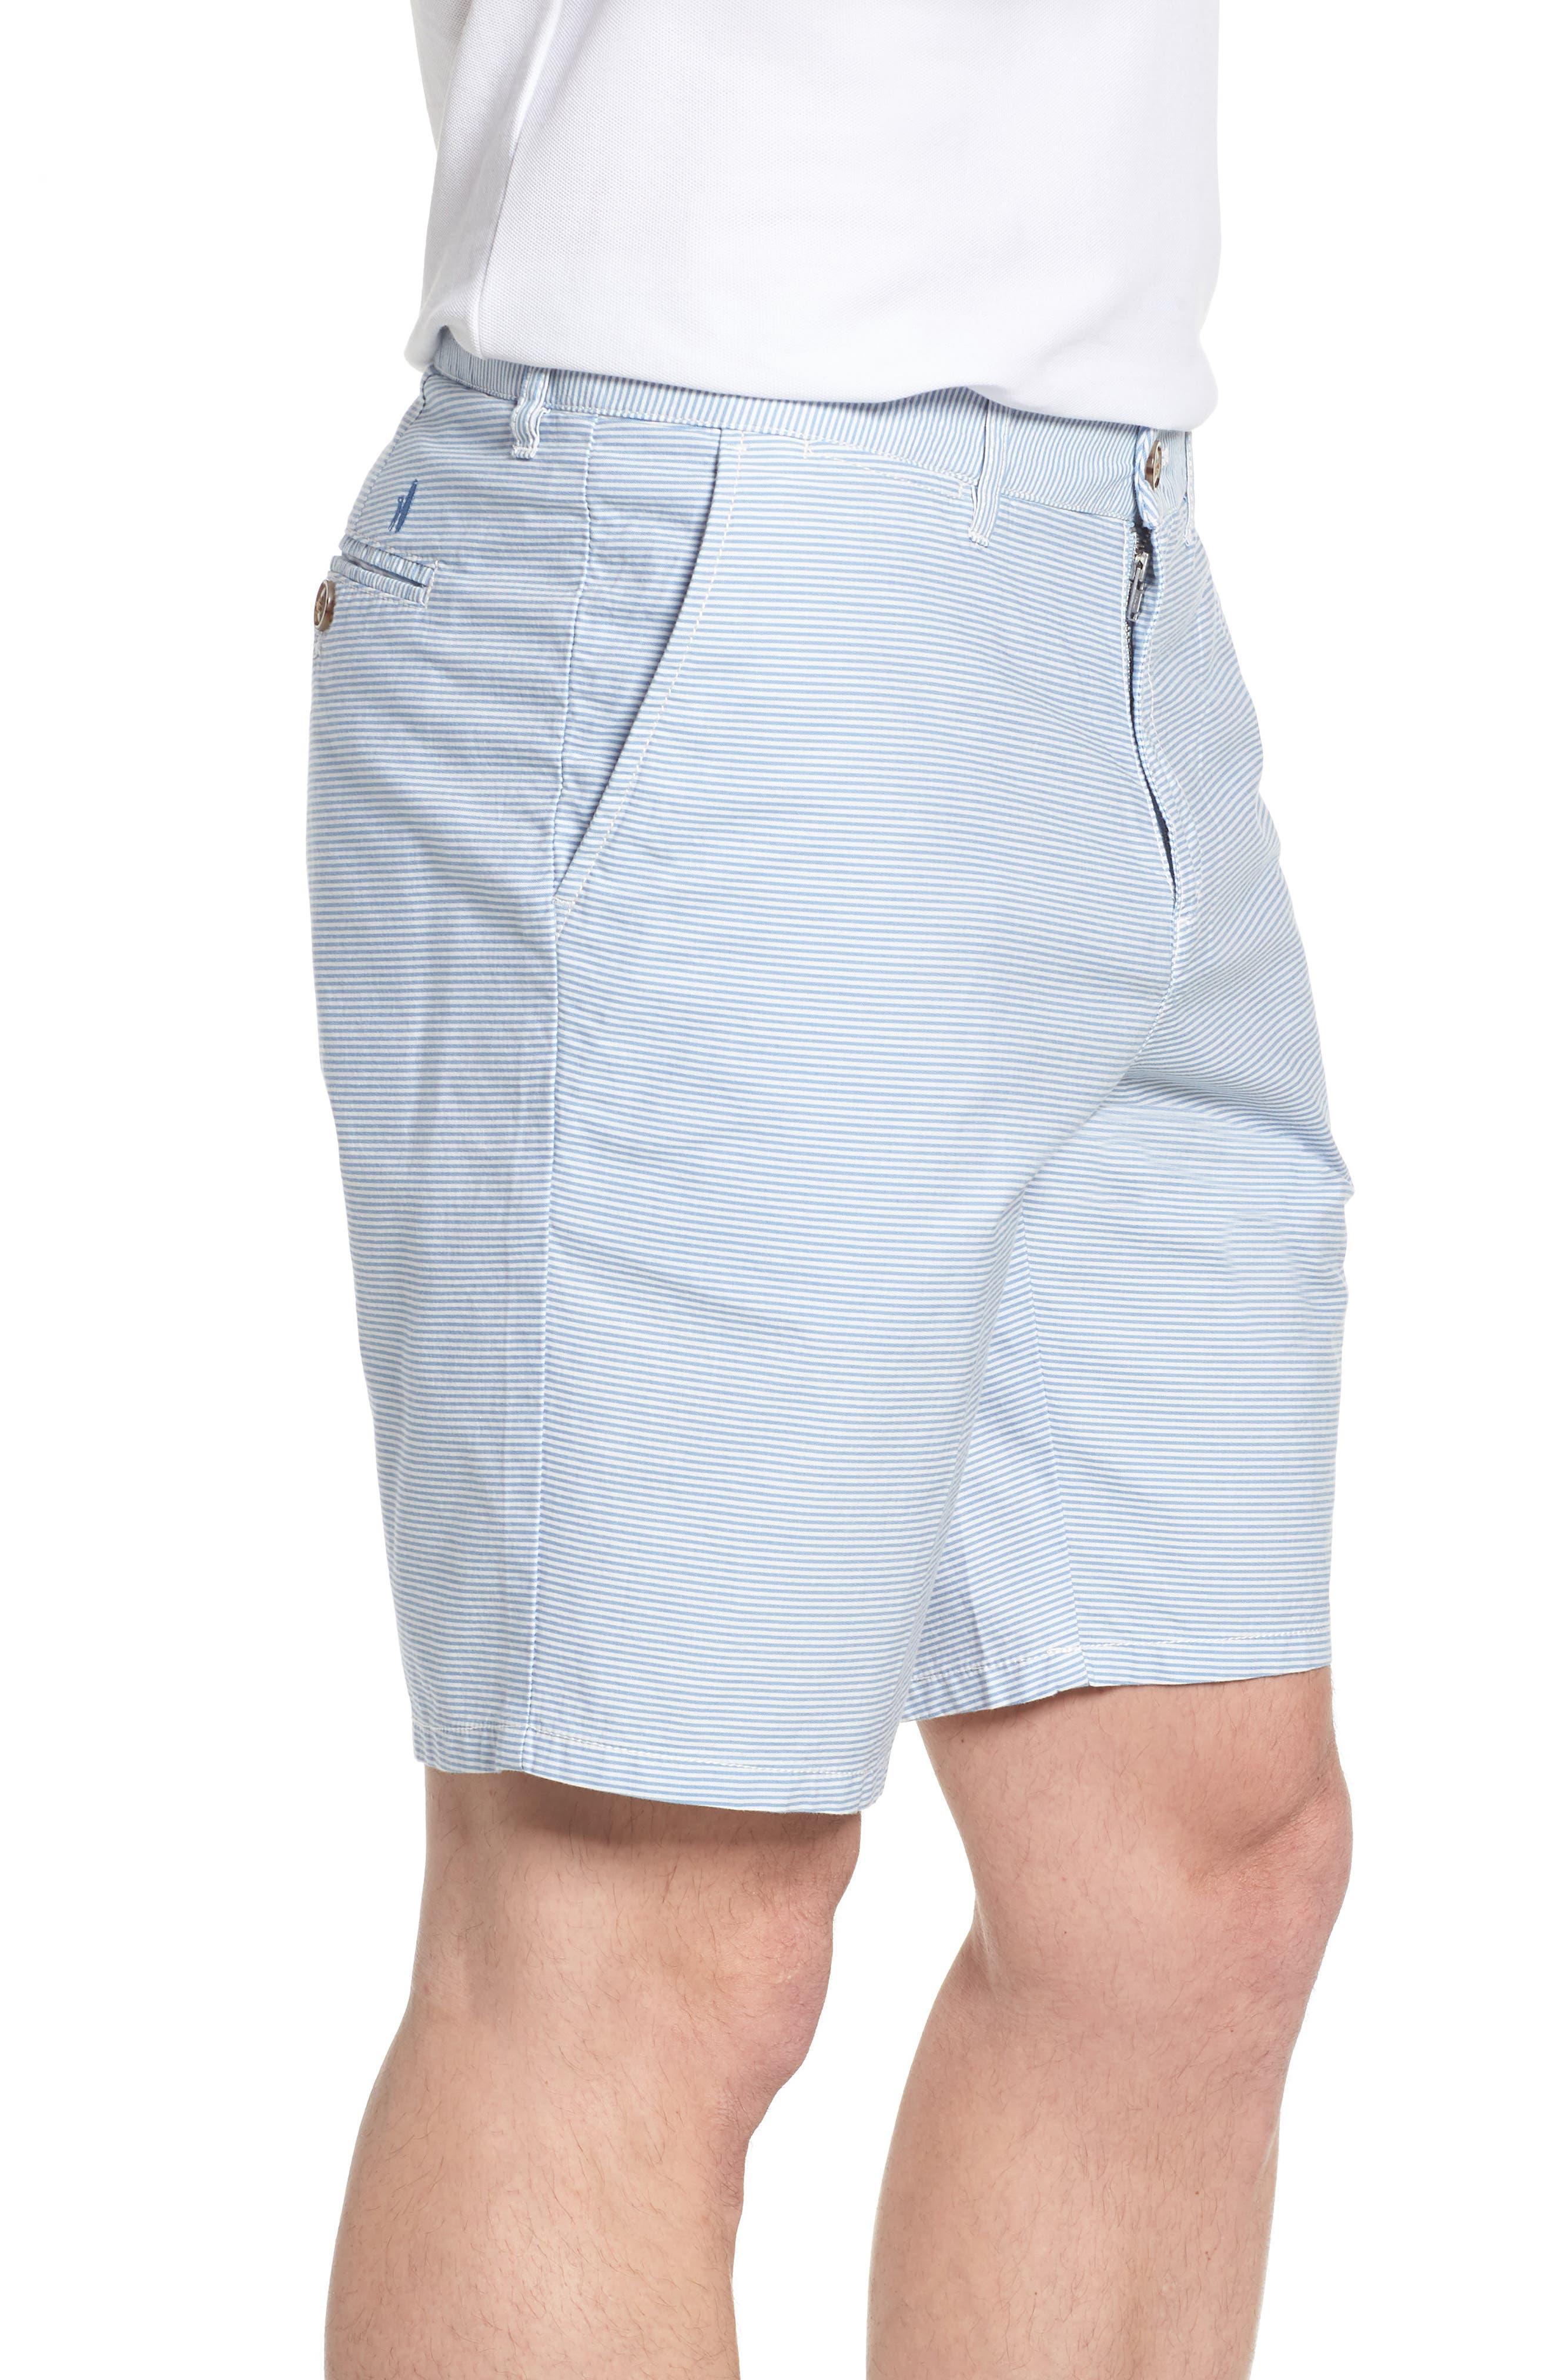 Geordy Regular Fit Pinstripe Shorts,                             Alternate thumbnail 3, color,                             400